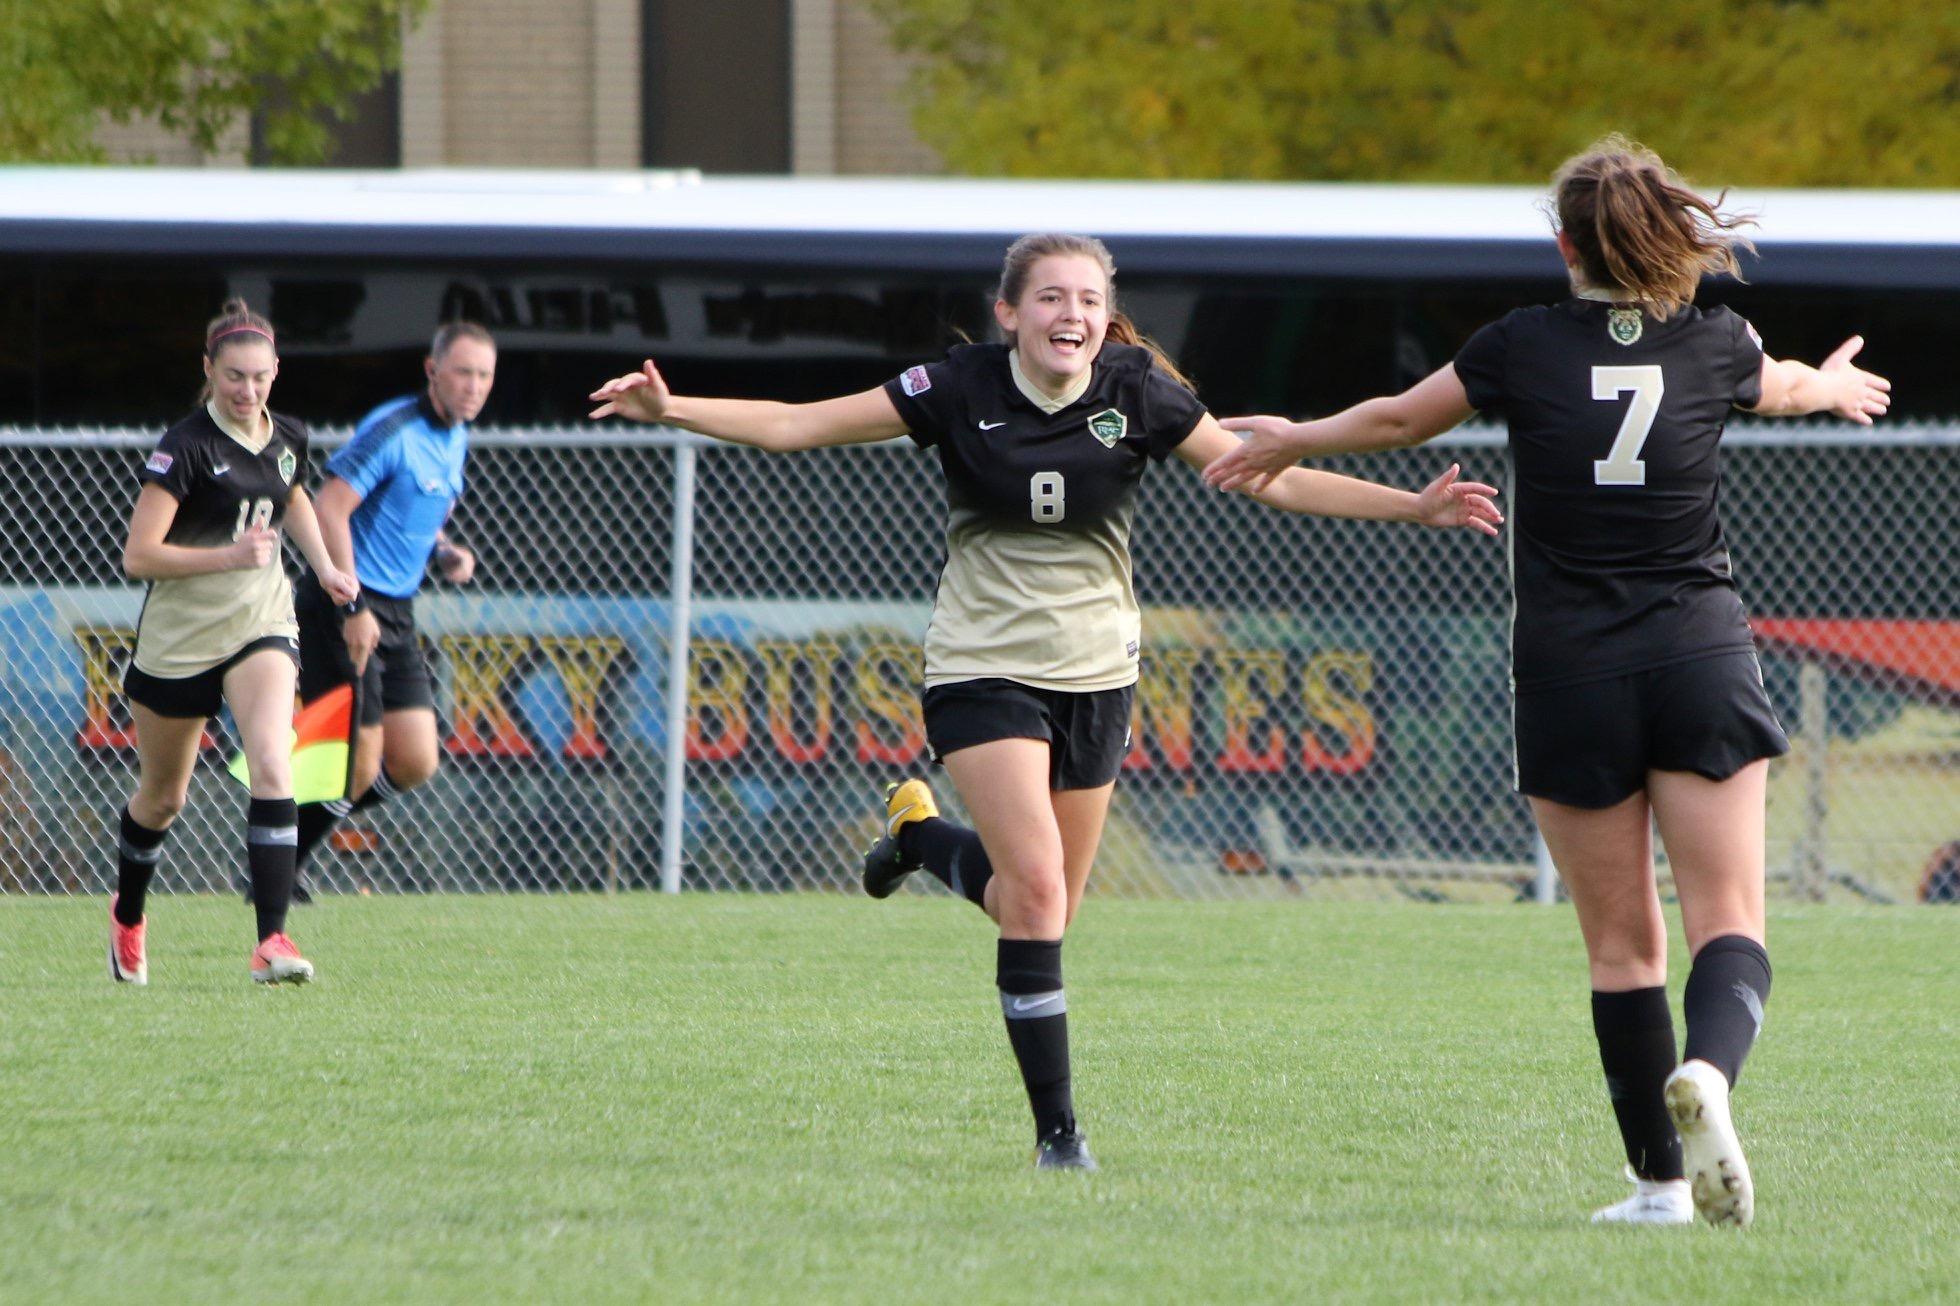 Amber Pearson - U.S Soccer Scholarships